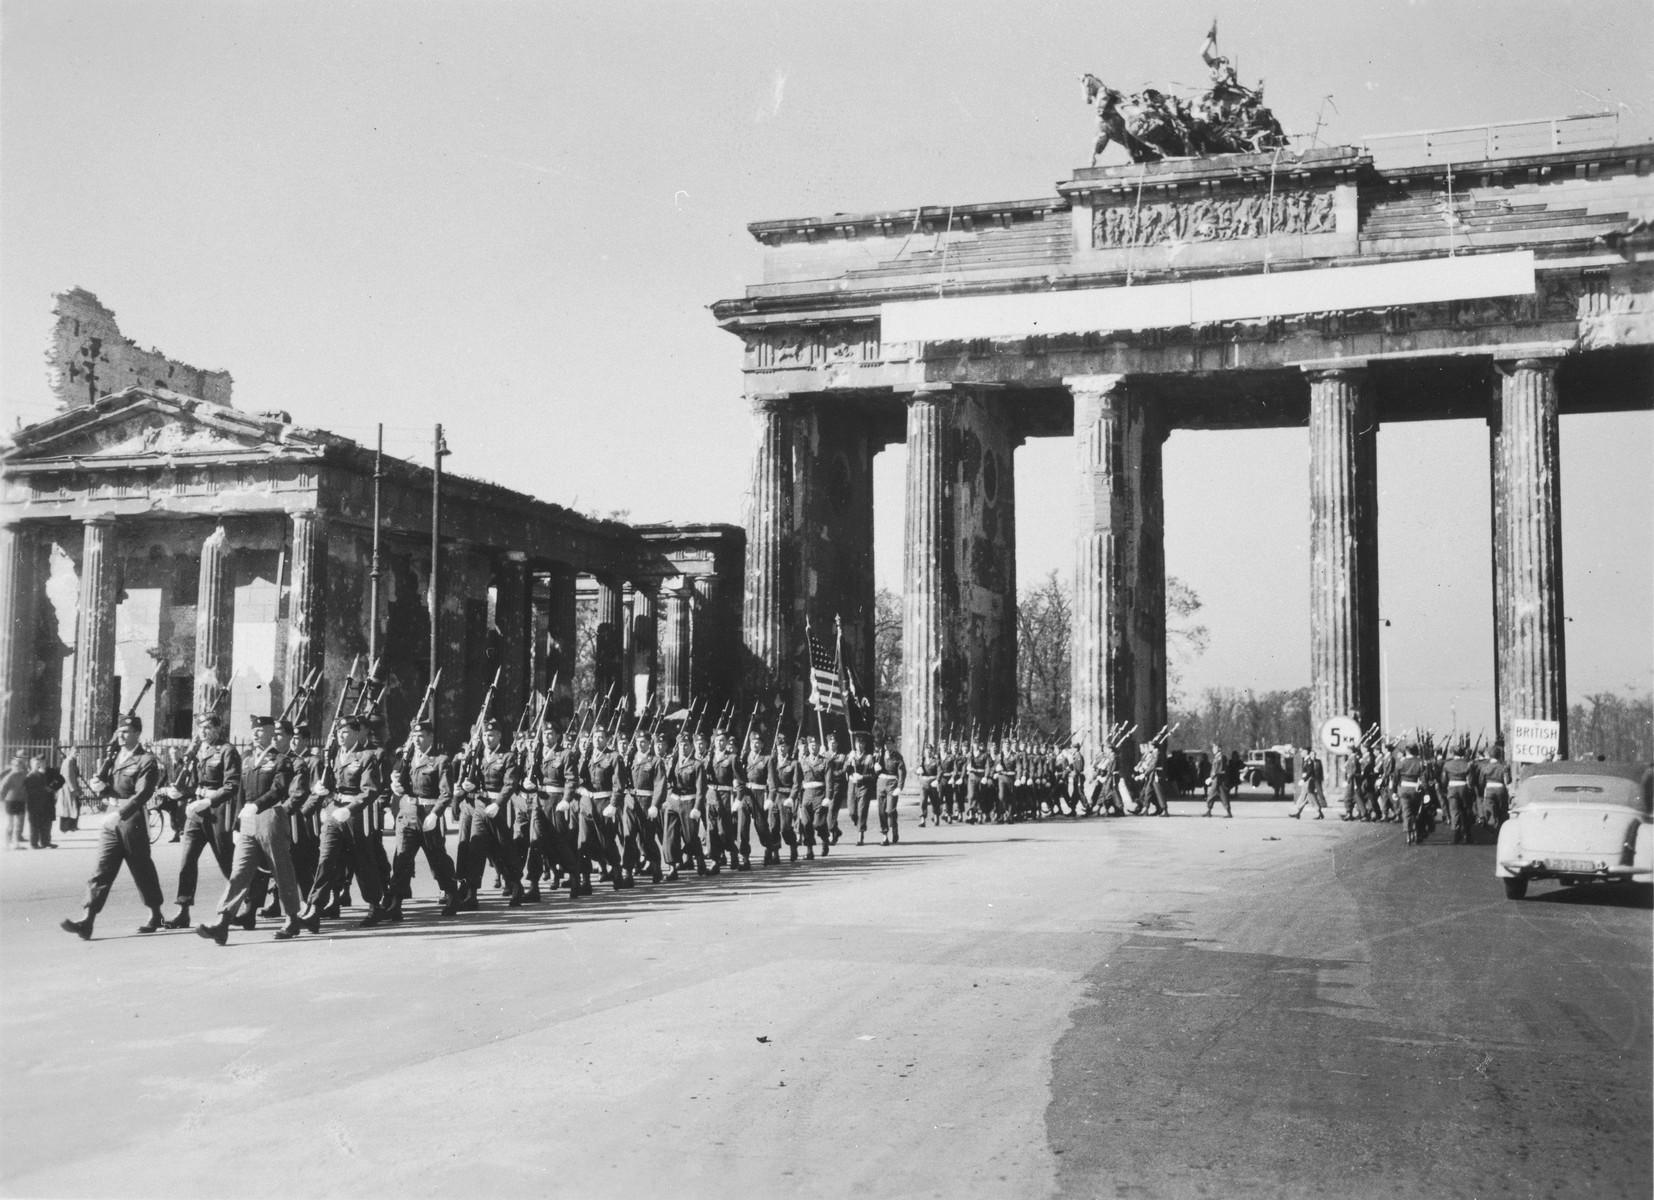 U.S. Army troops march through the Brandenburg Gate in Berlin.